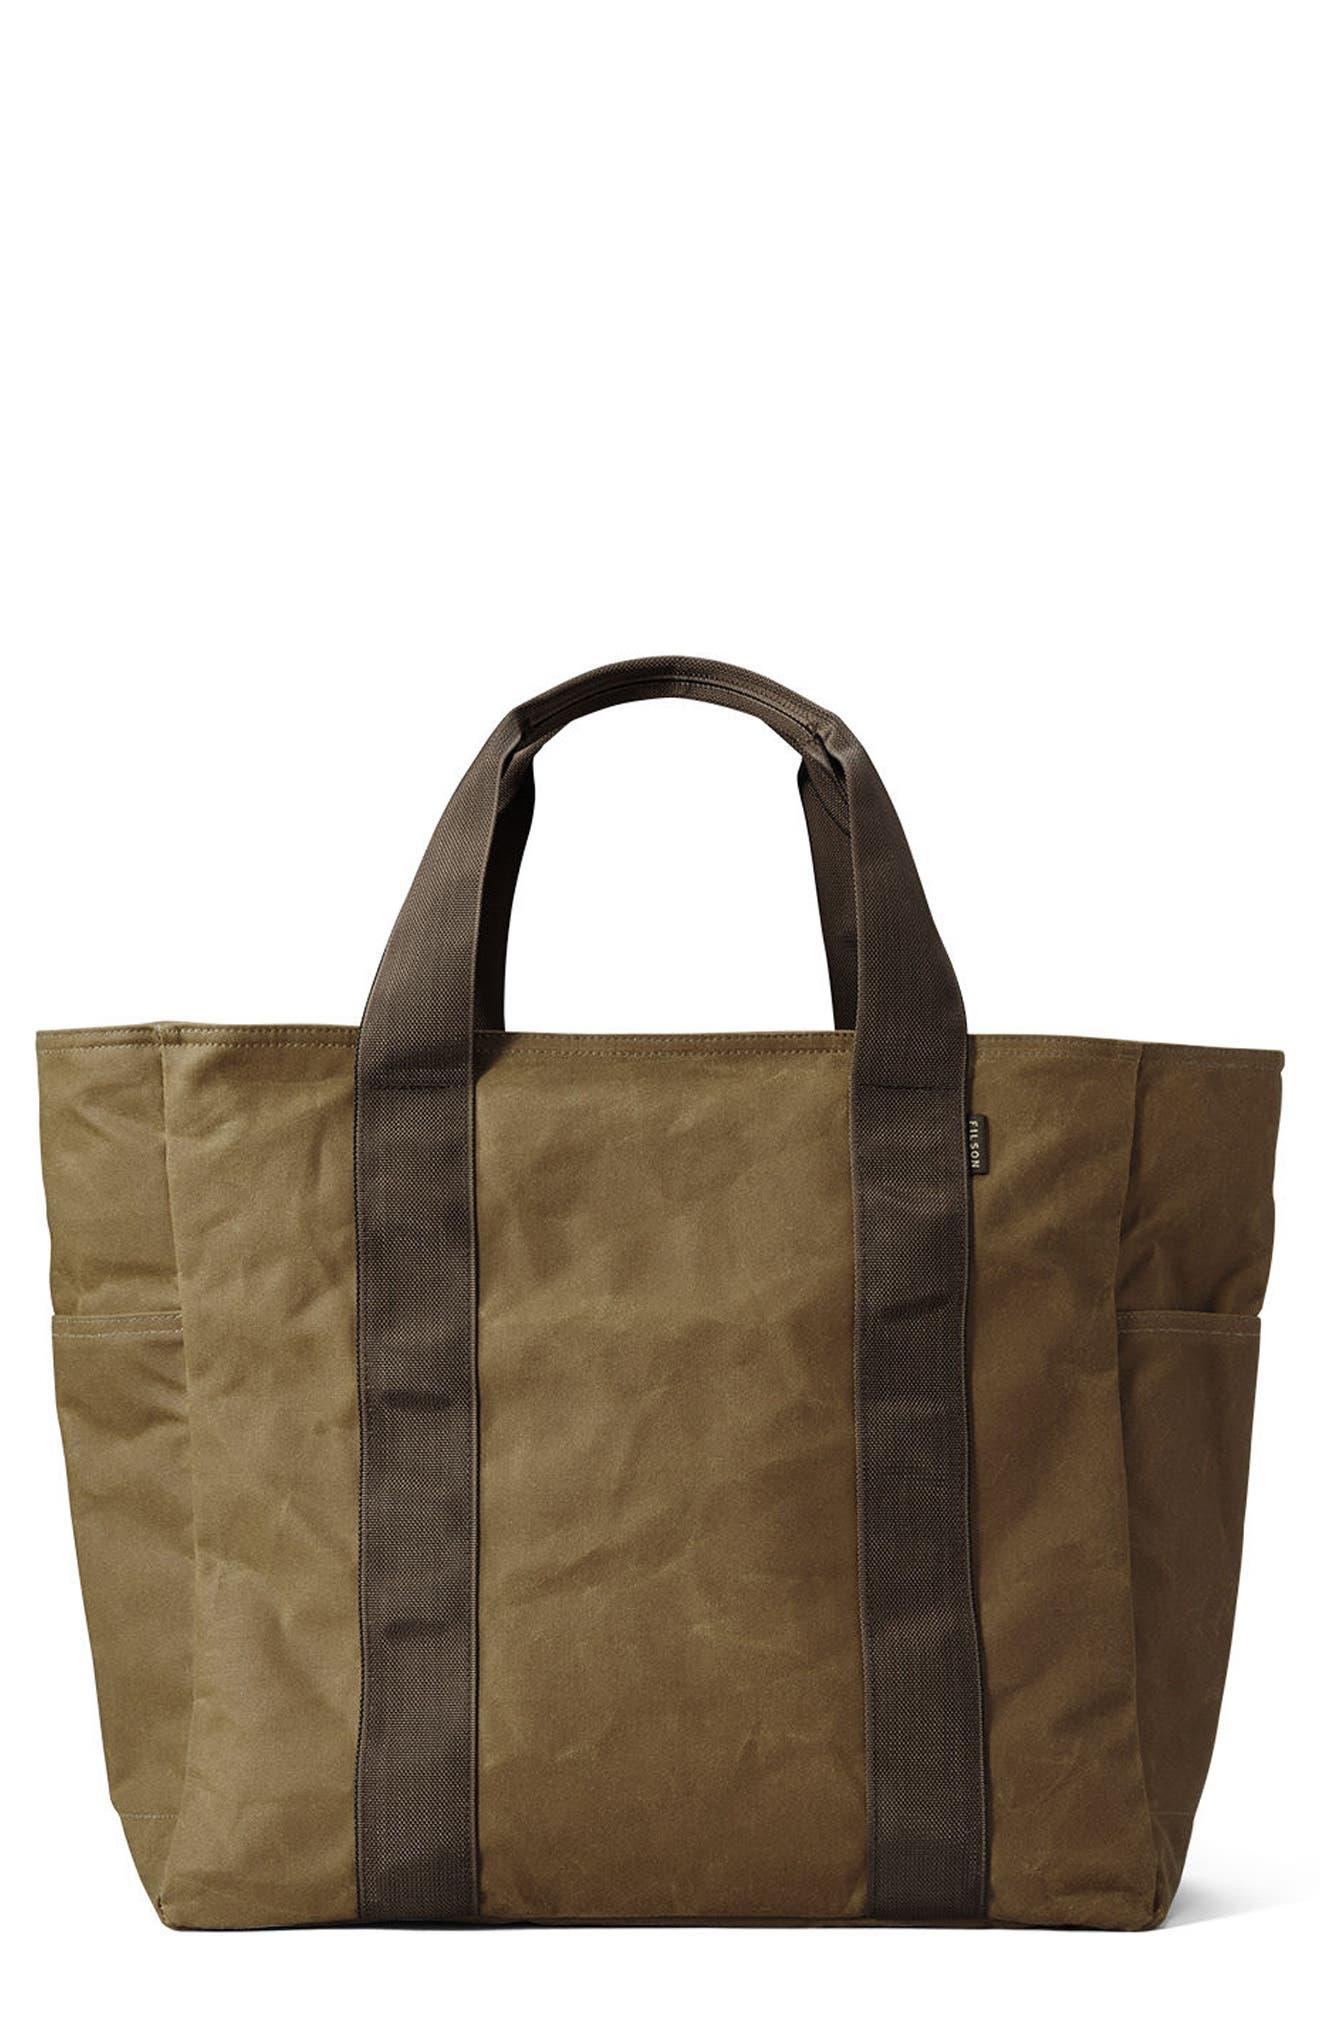 Image of Filson Large Grab 'n' Go Tote Bag